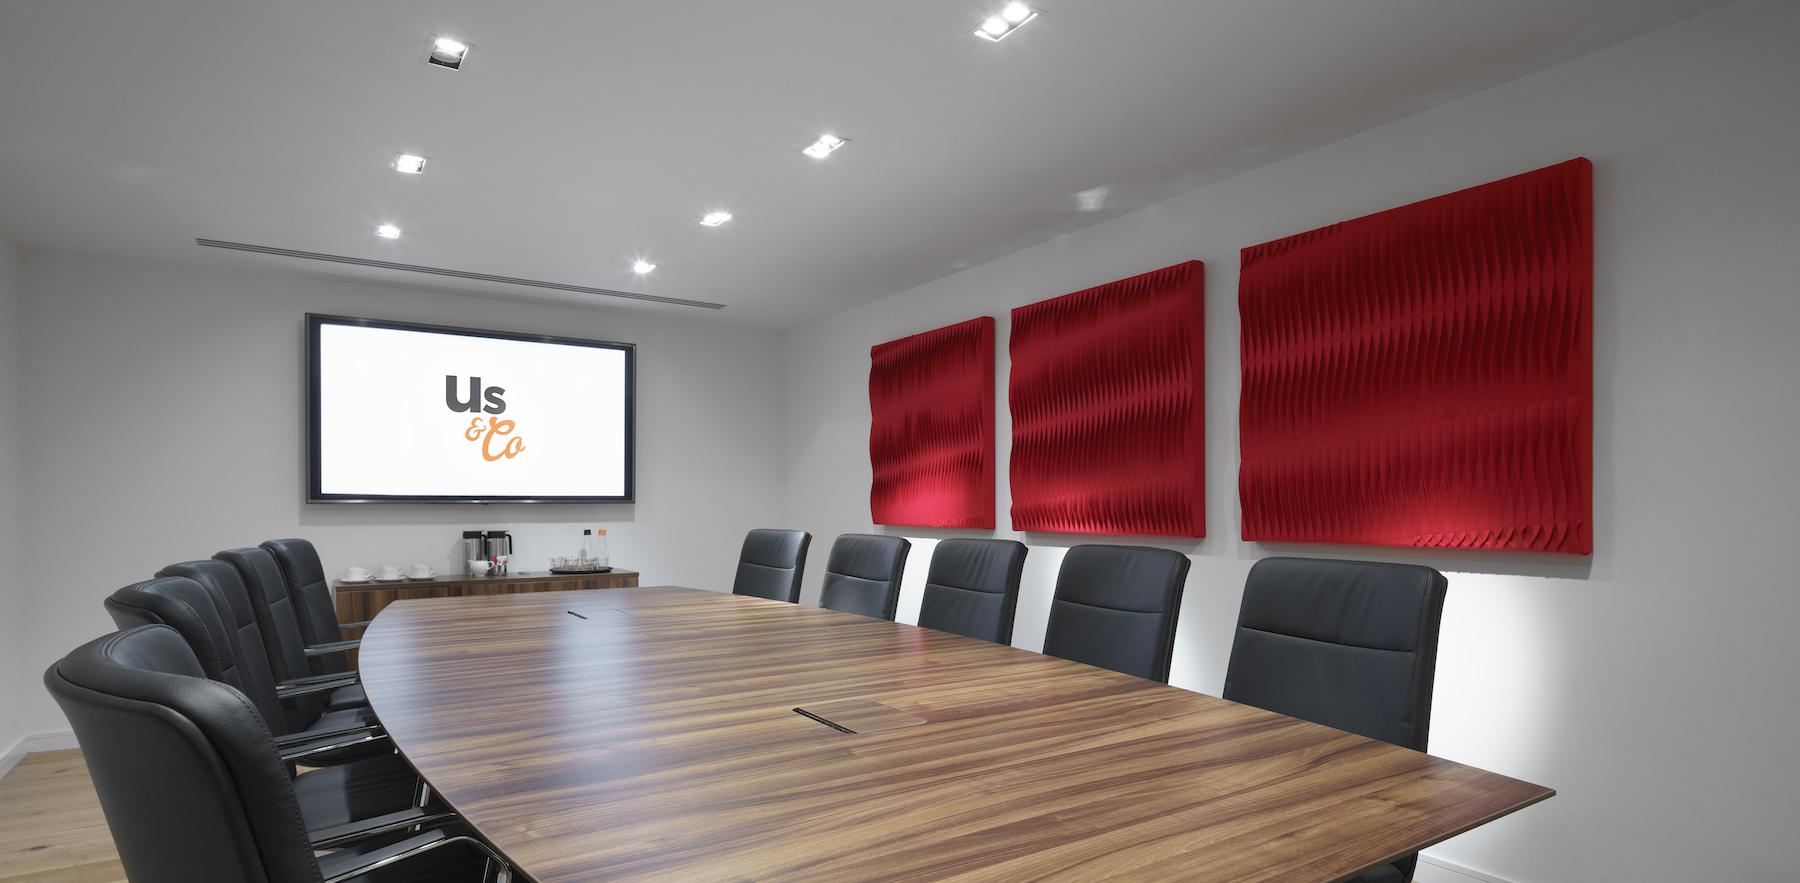 Us&co Dublin Boardroom 1